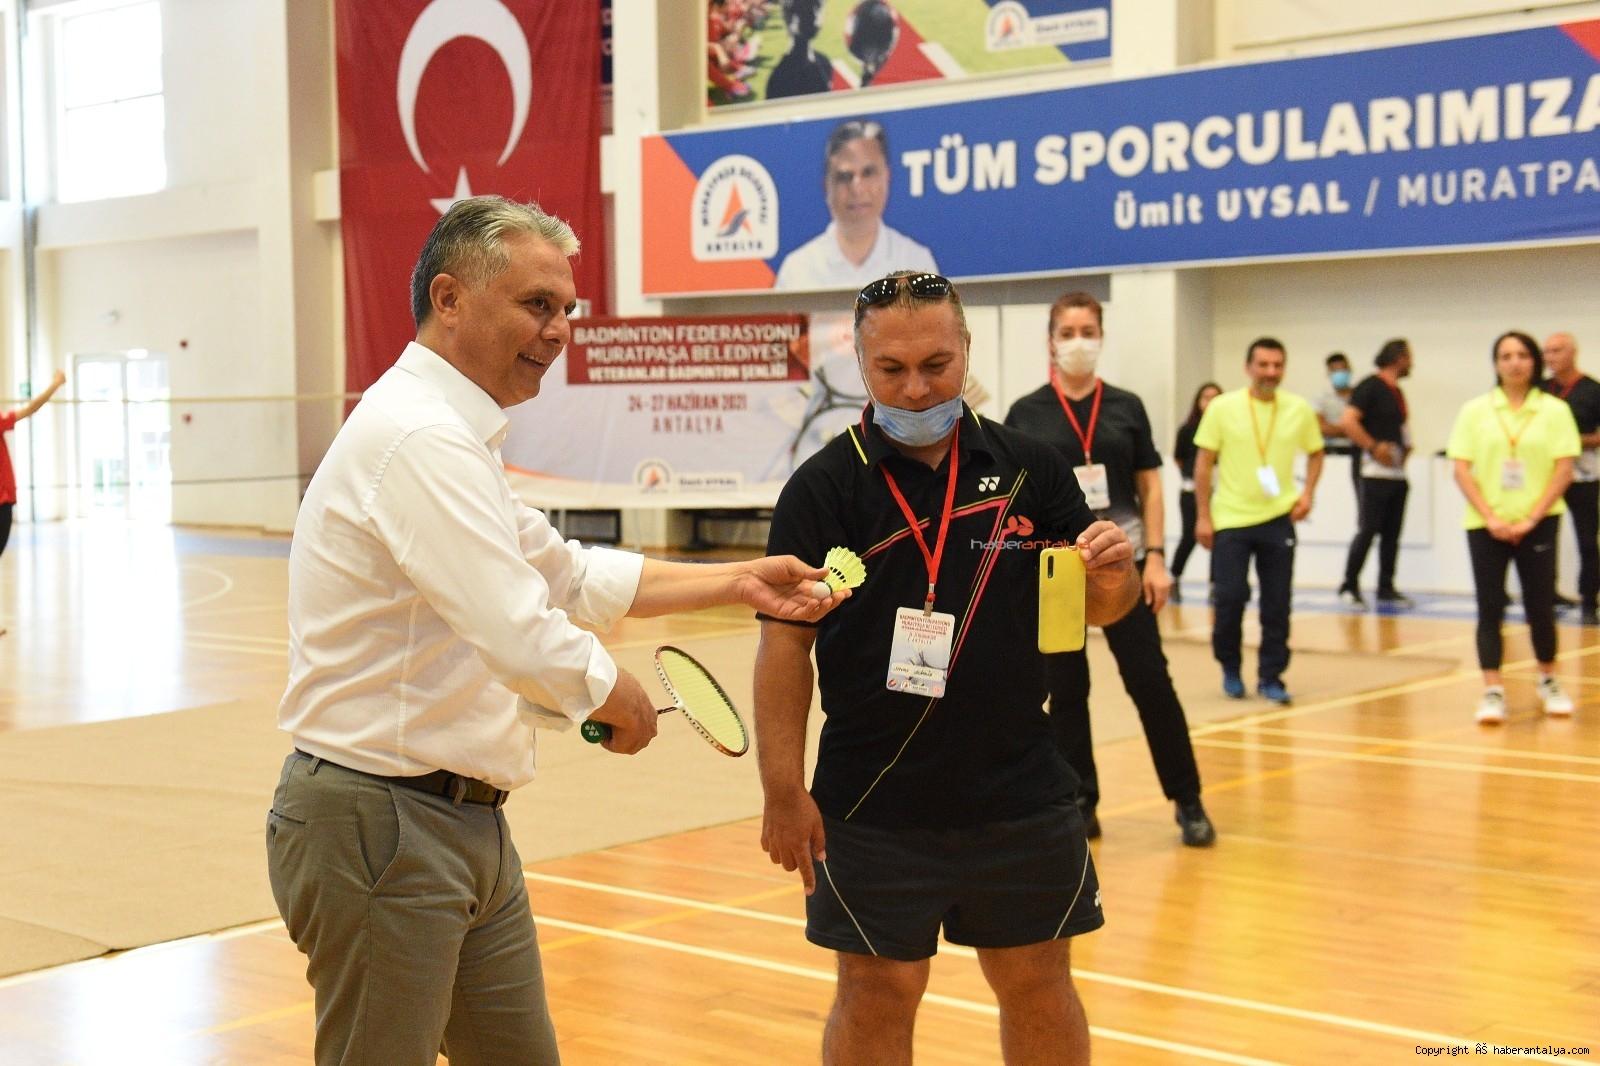 2021/06/badminton-senligi-acilis-vurusu-baskan-uysaldan-20210624AW35-1.jpg